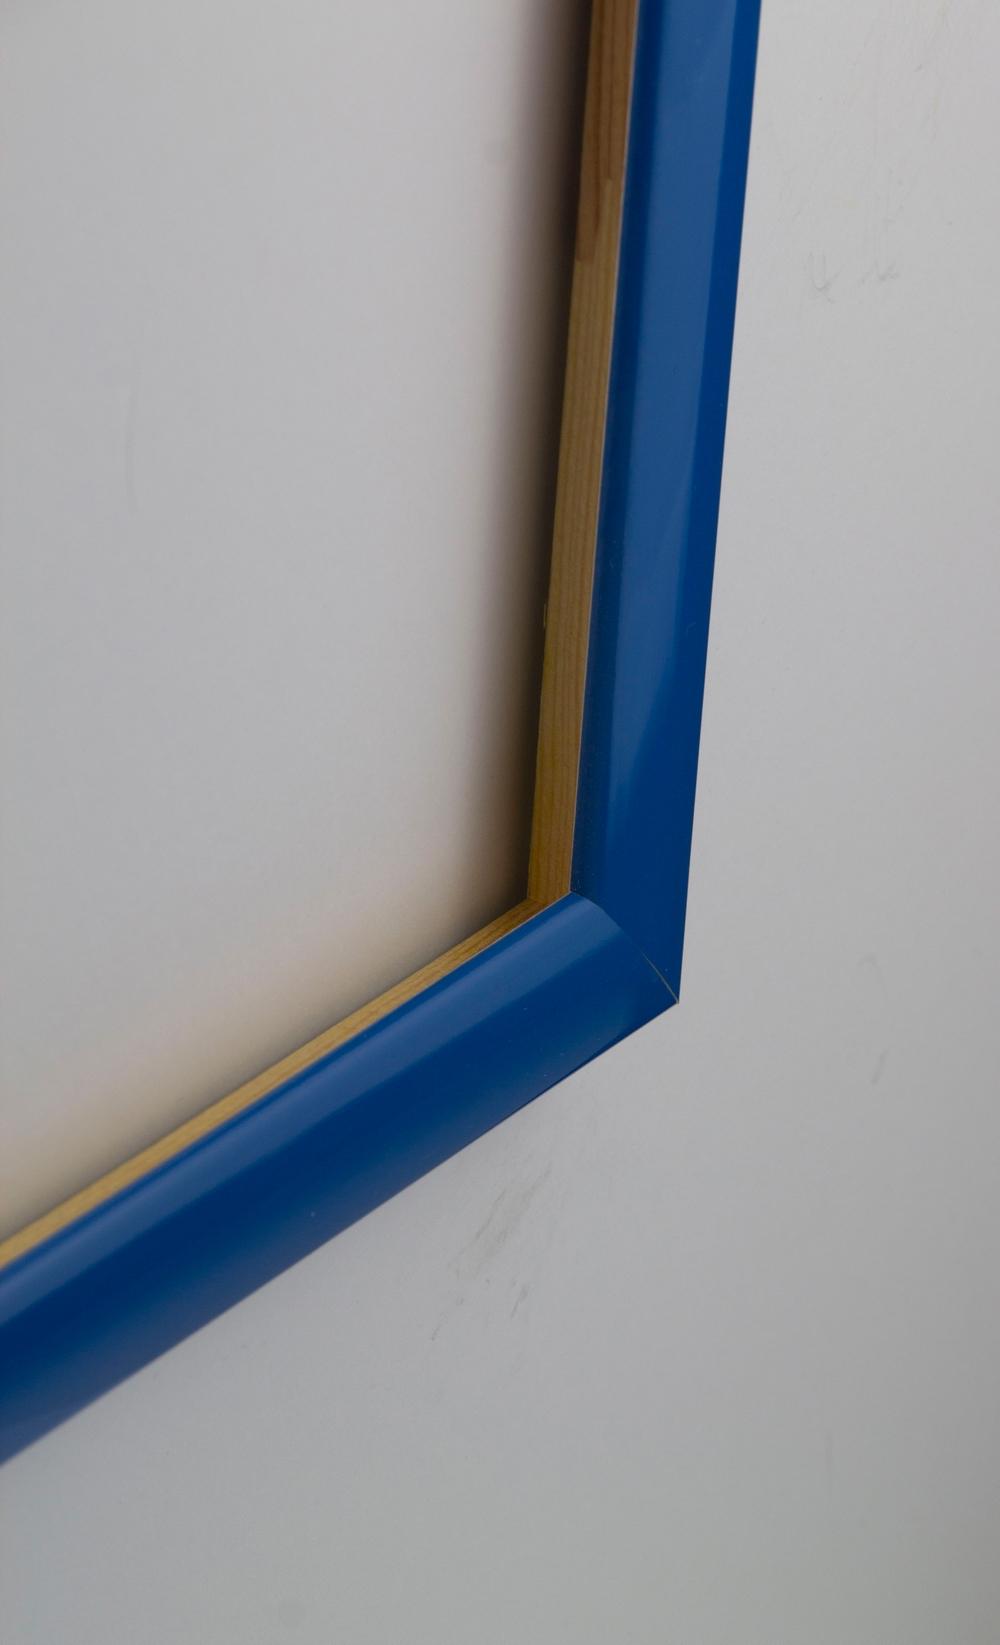 Orlando Bilderrahmen Massivholz Größenwahl Acrylglas klar Hellblau ...